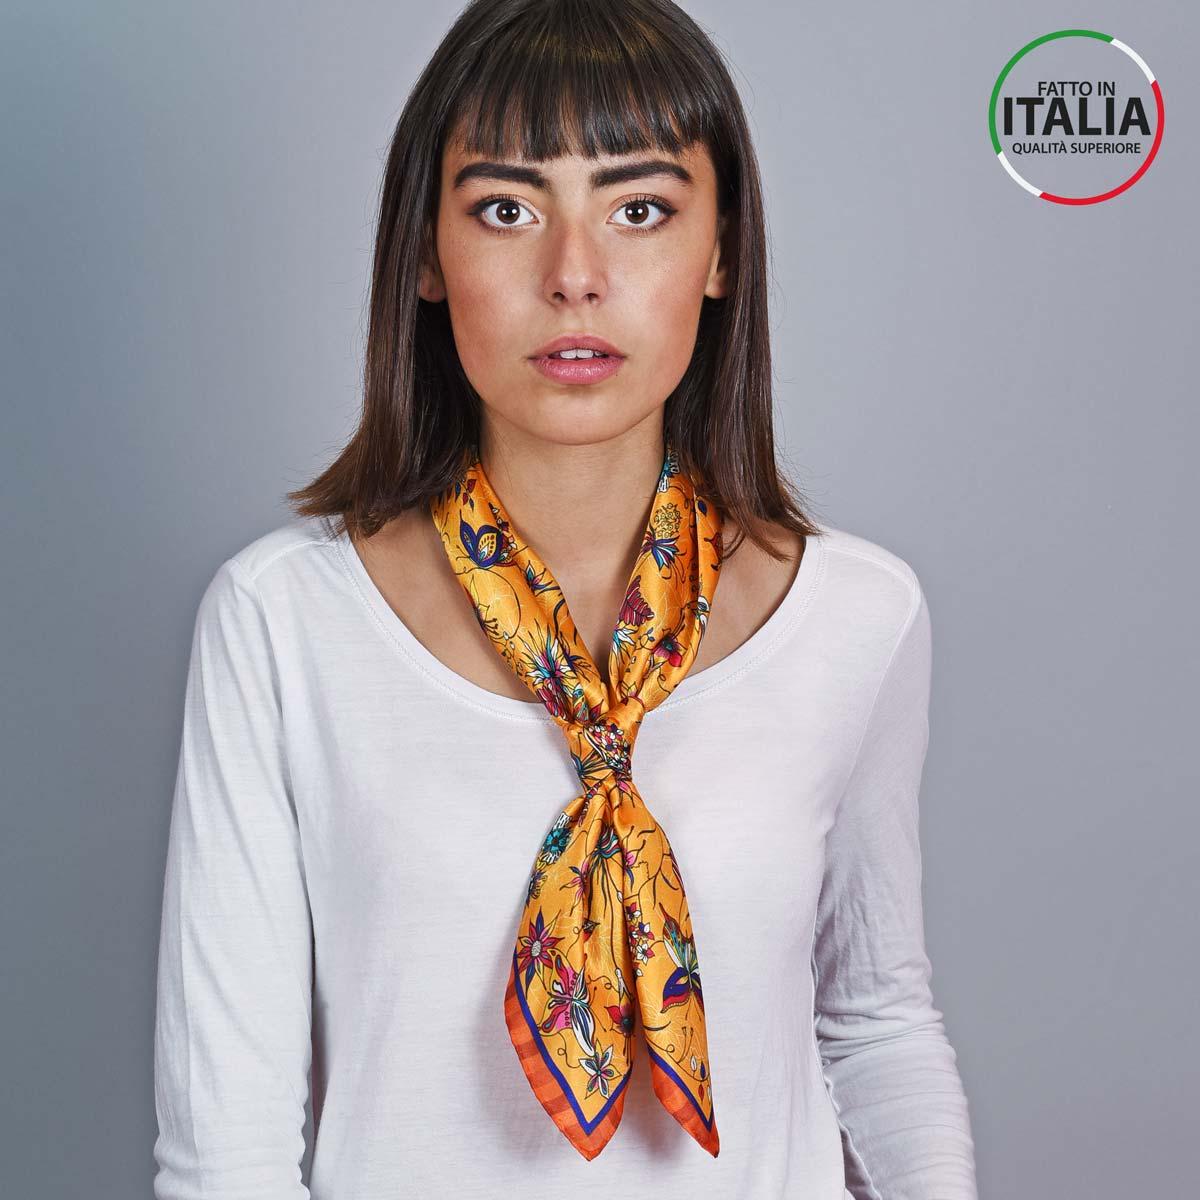 AT-05393_W12-2IT_Carre-en-soie-jaune-orange-made-in-italie